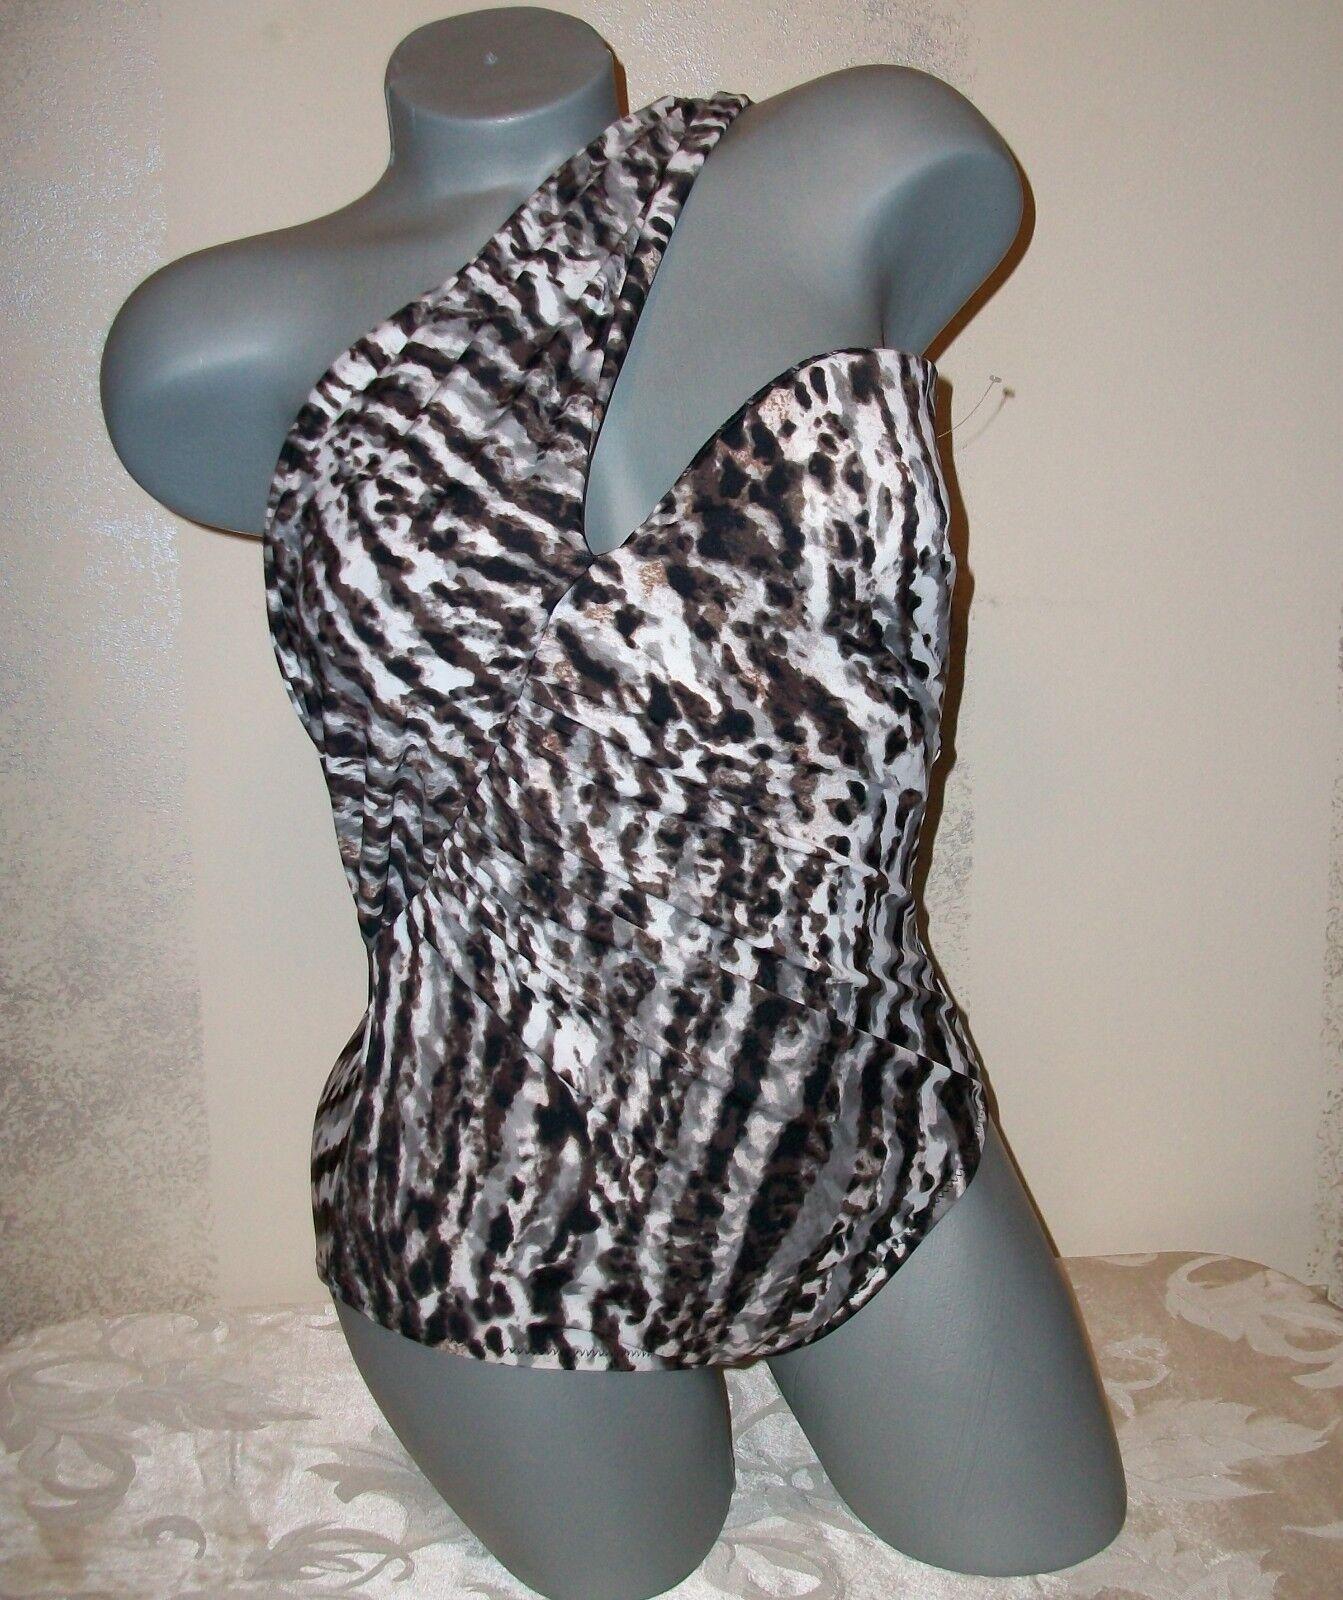 164 Victoria Secret Magicsuit Goddess Animal Print Swimsuit 8